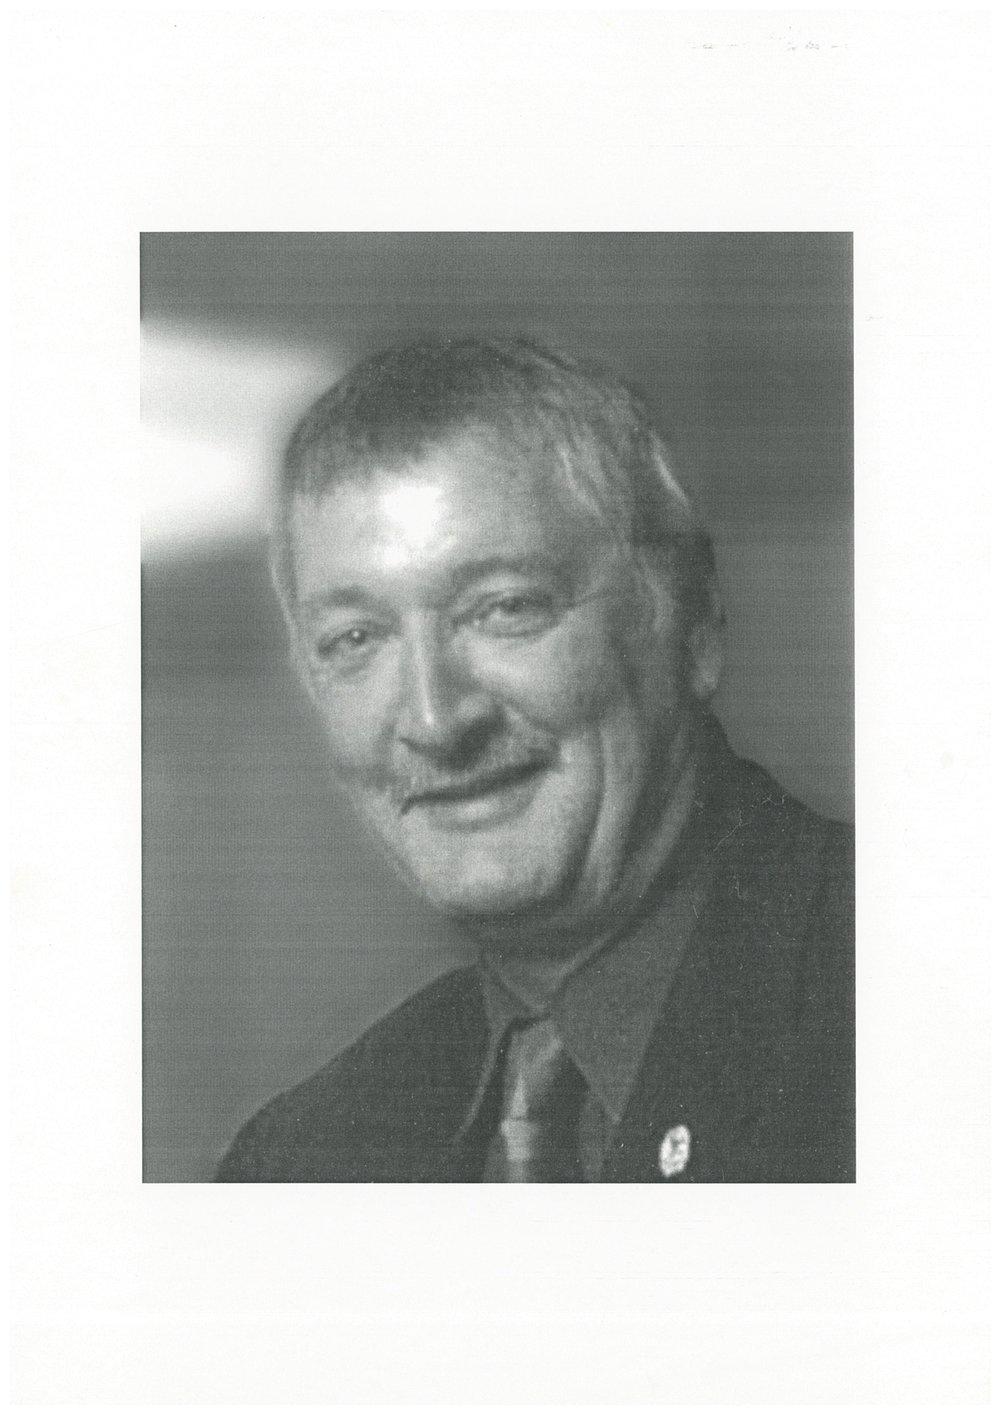 1997 - PETER OTAGO